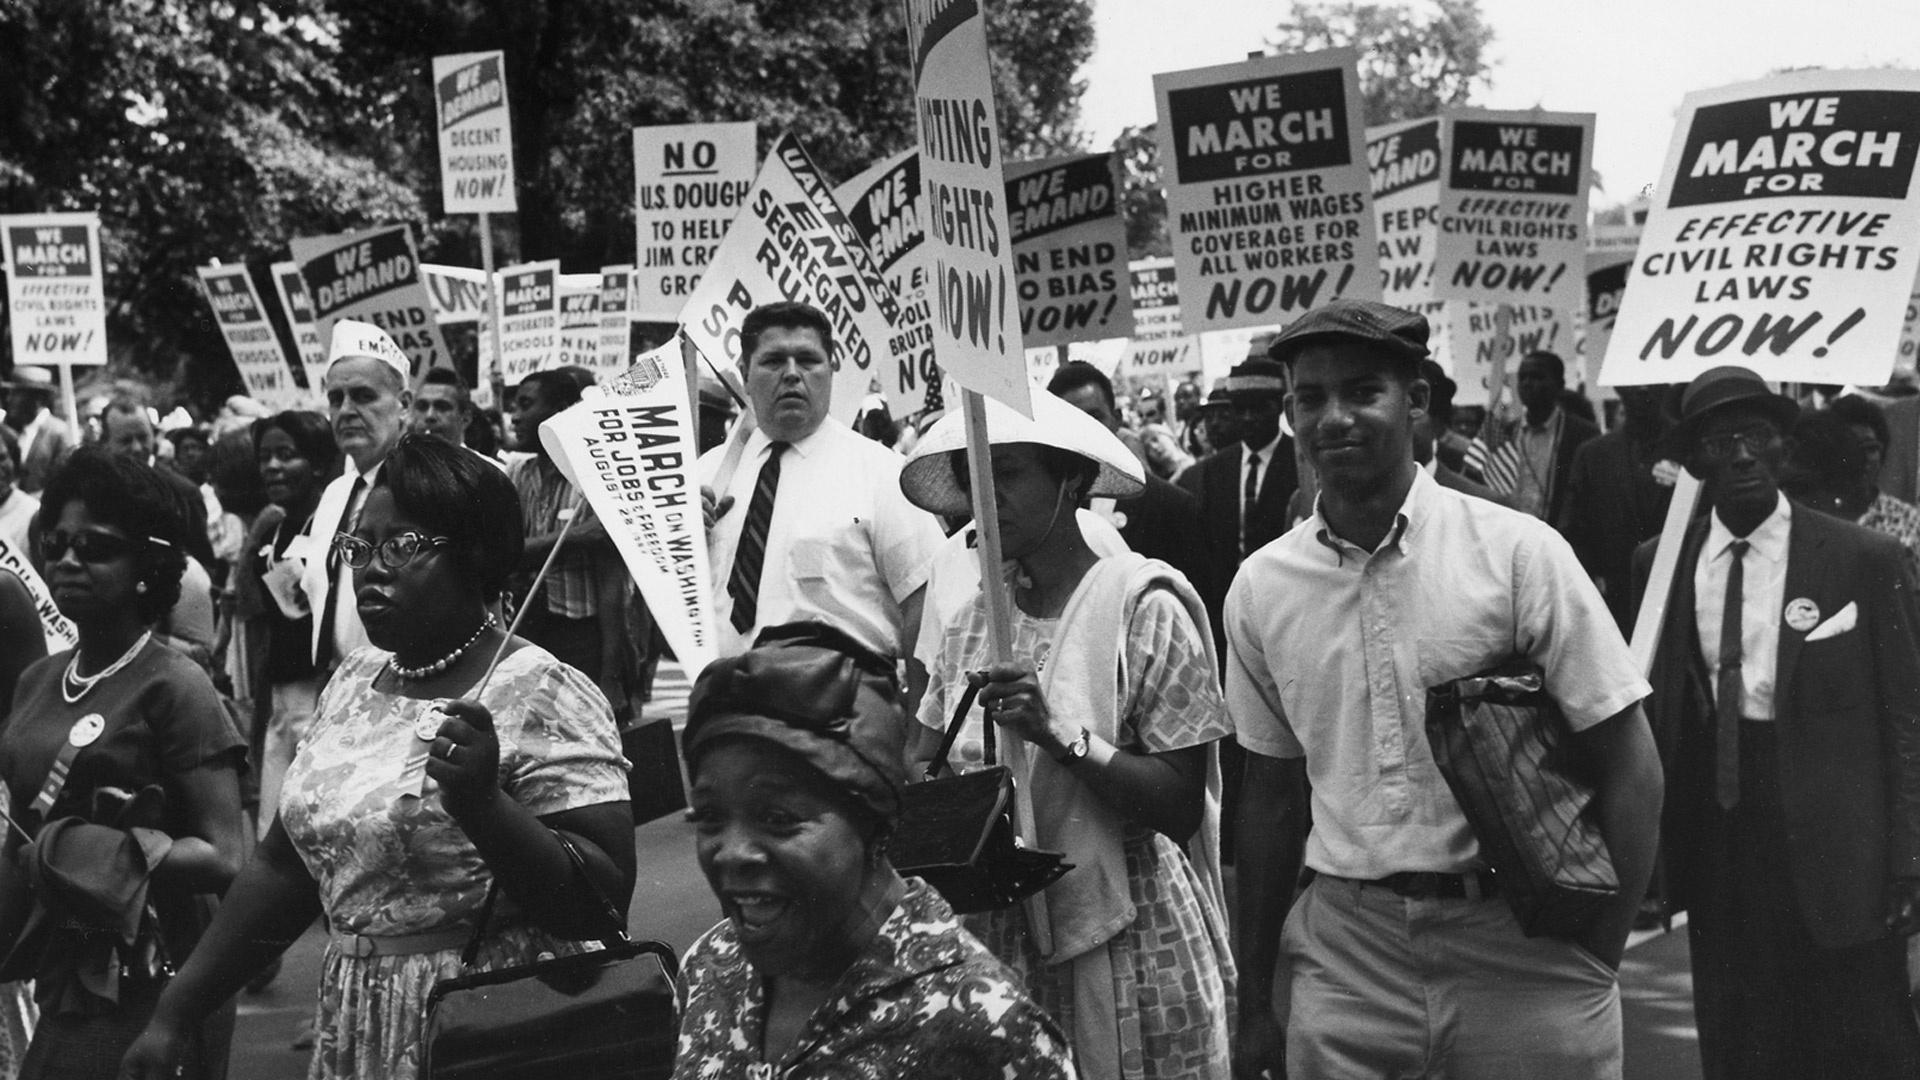 March on Washington 50th Anniversary, Moral Mondays image